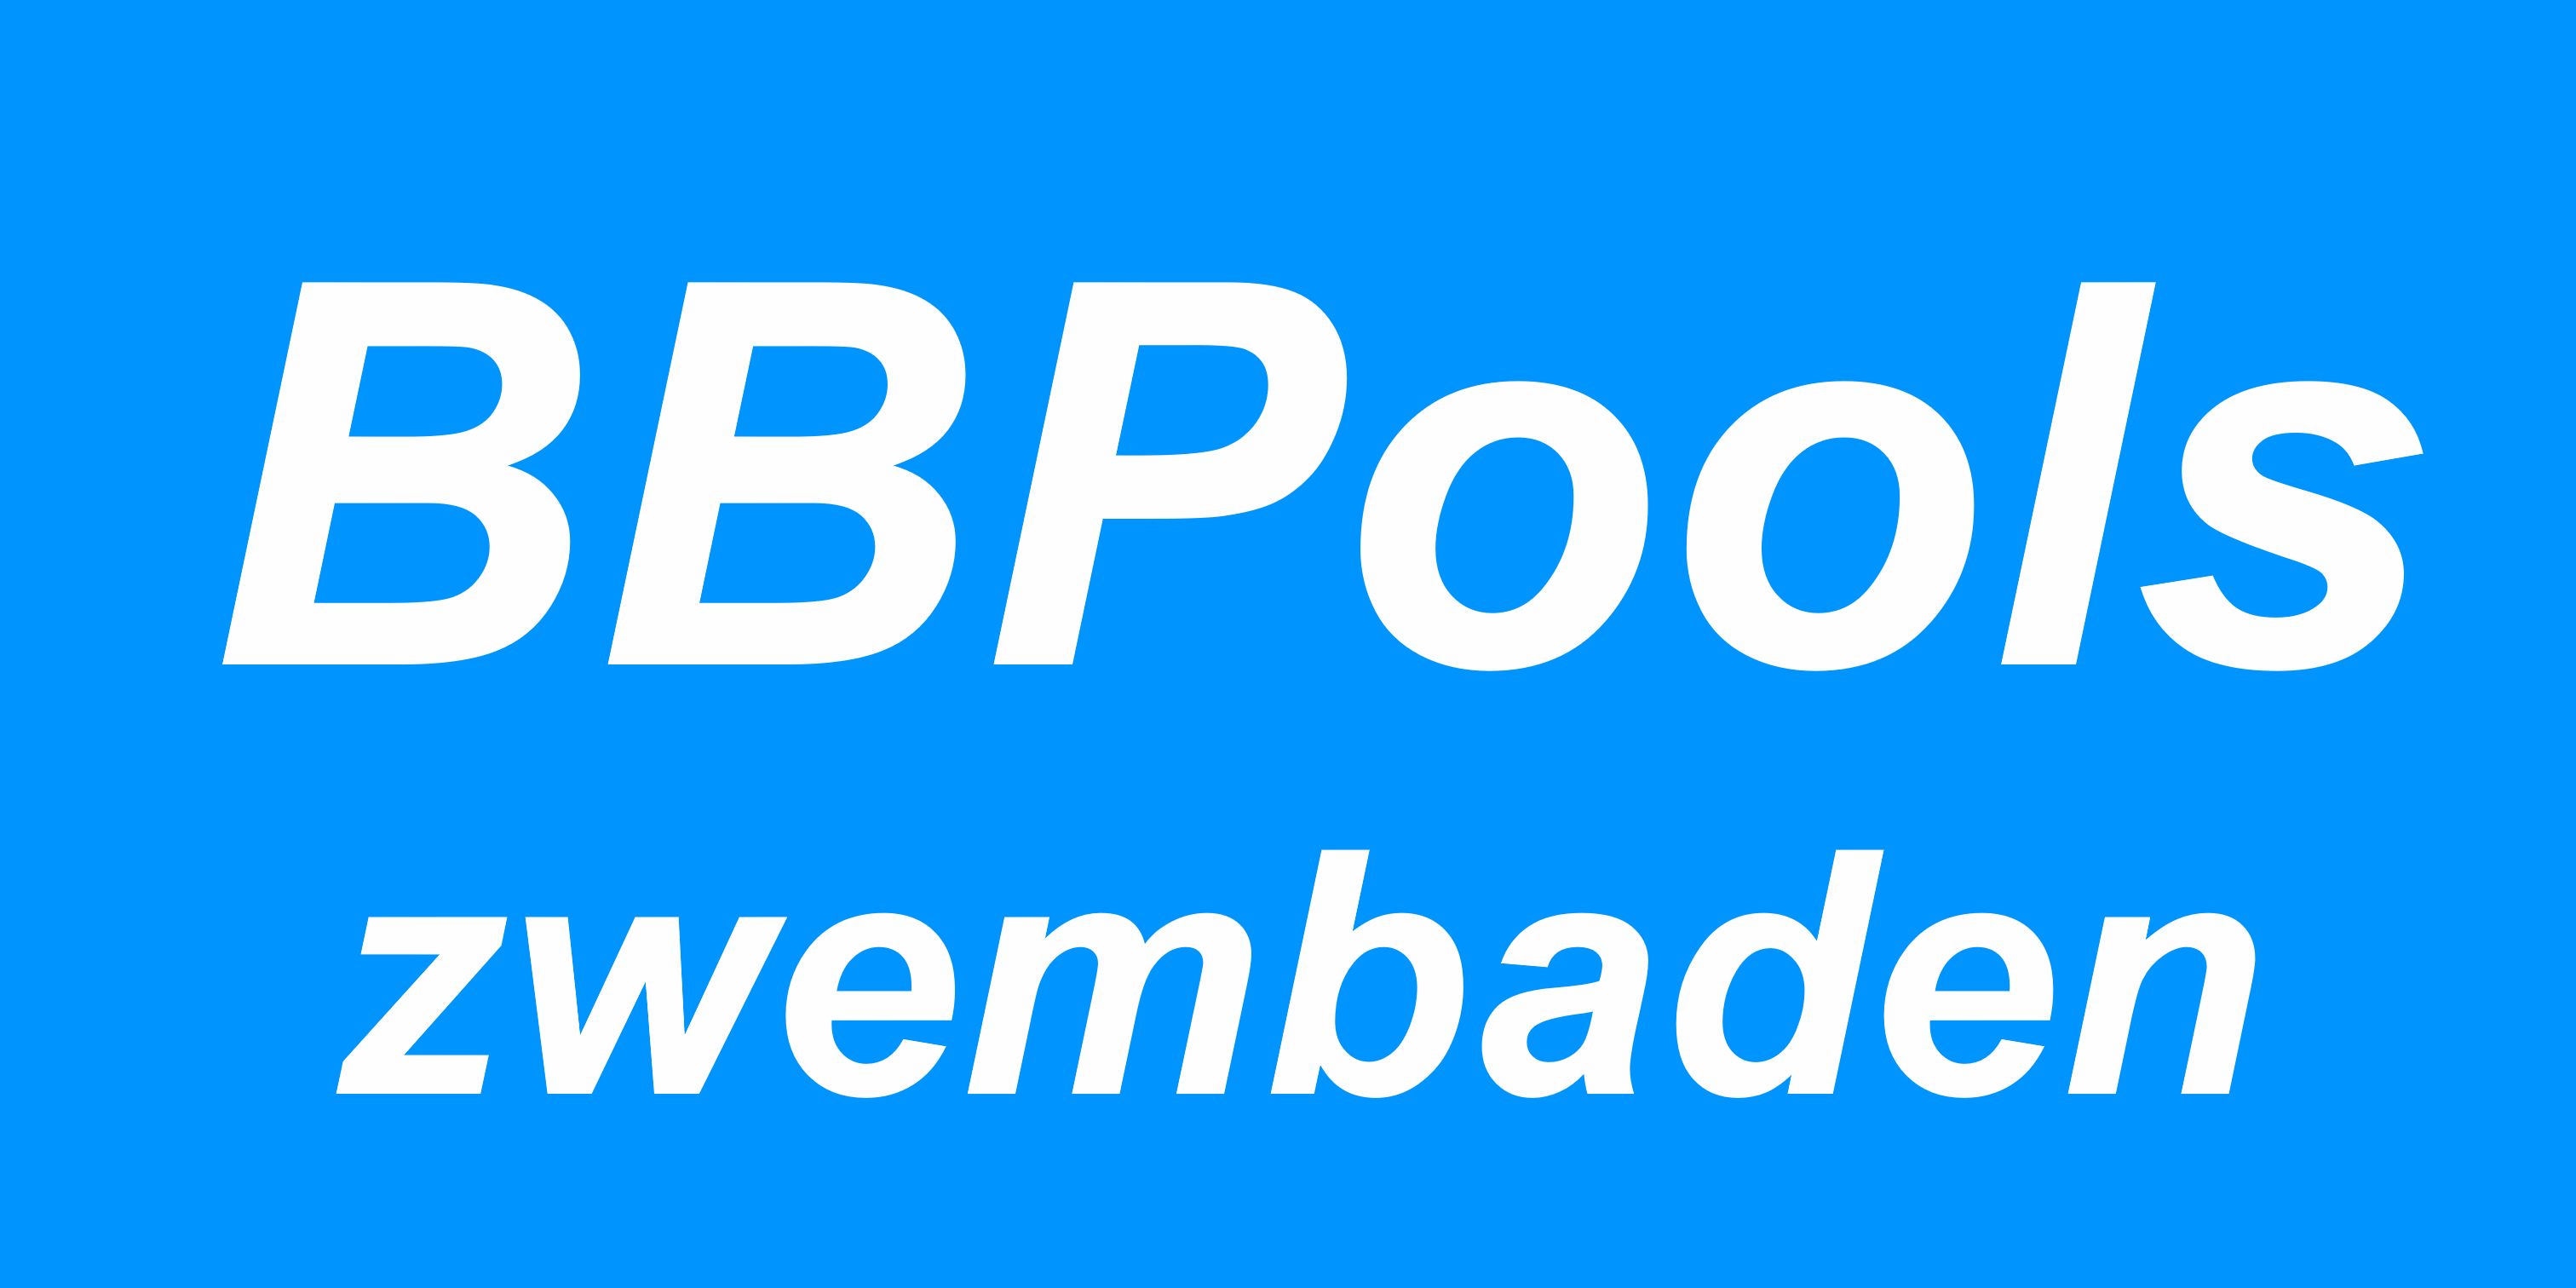 BB POOLS